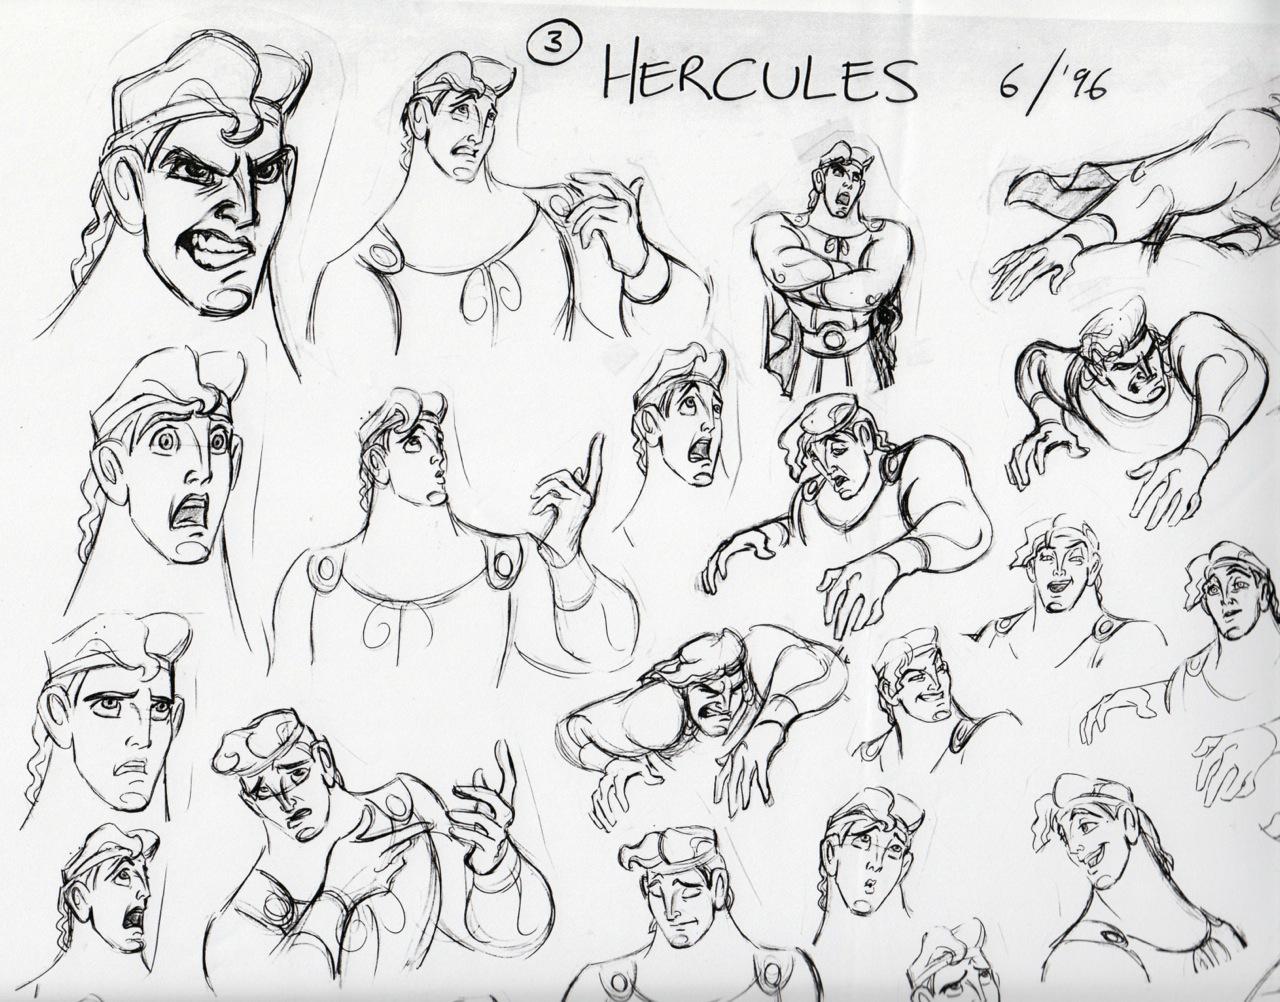 Disney Character Design Sheets : Deja view hercules